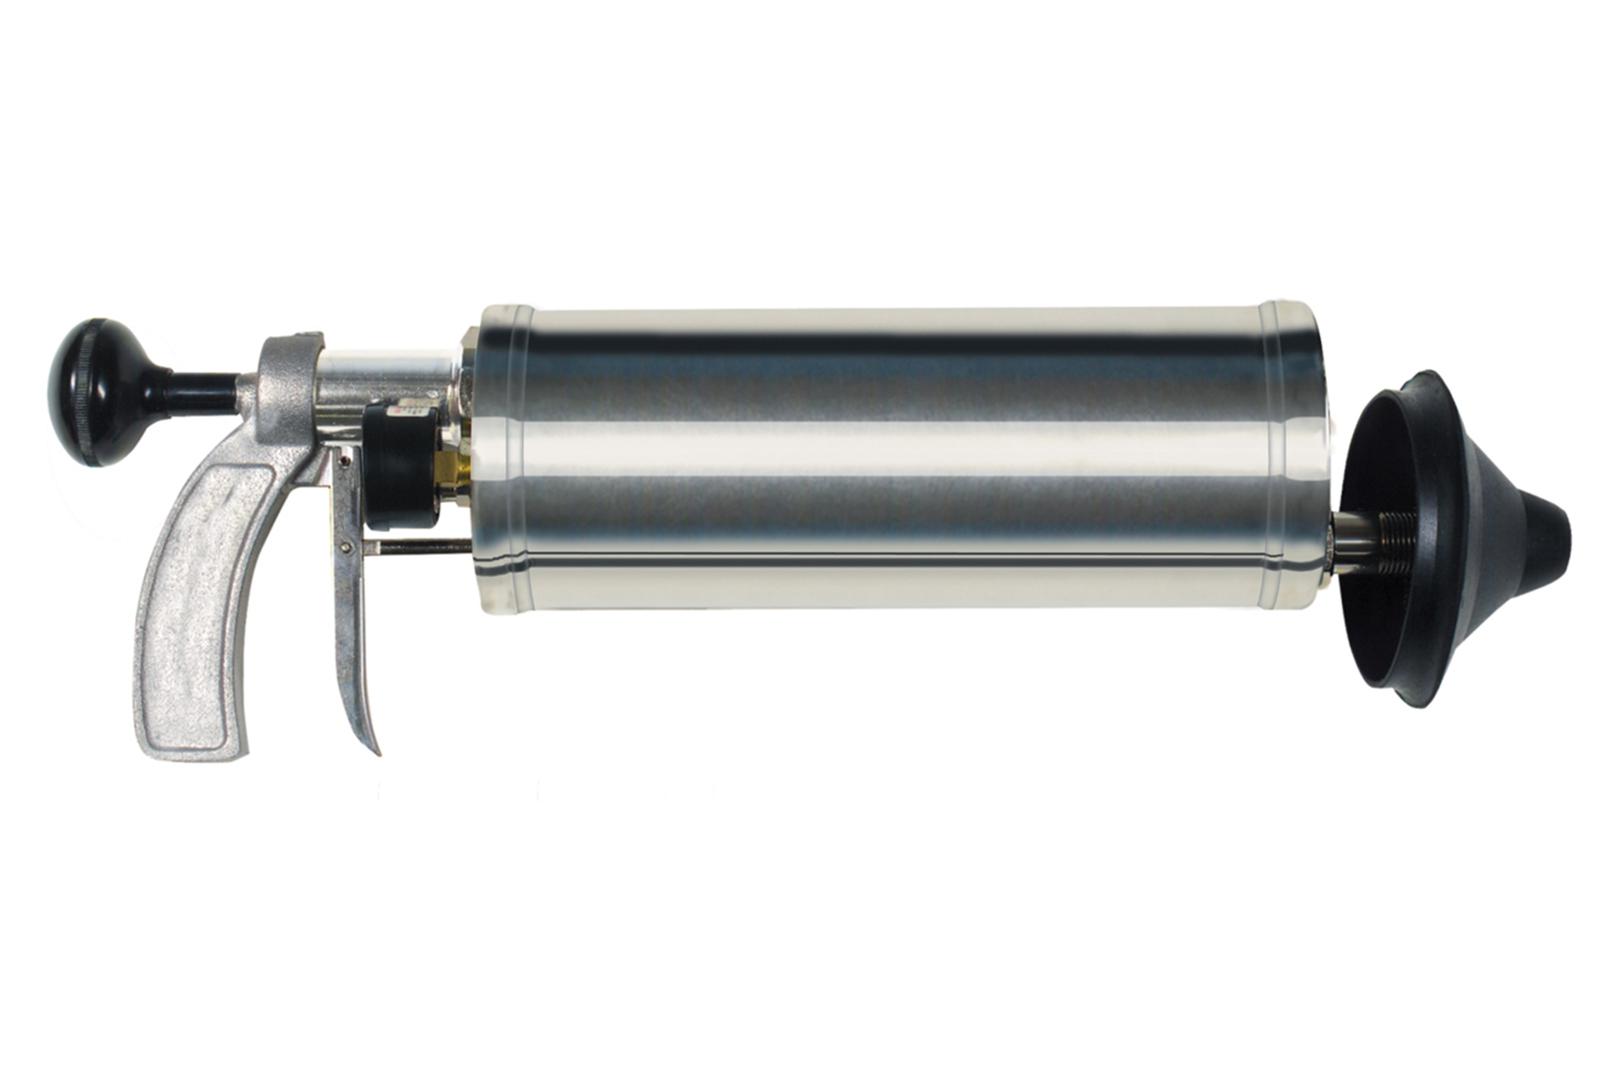 Пистолет промывочный General pipe Тайфун tns-c